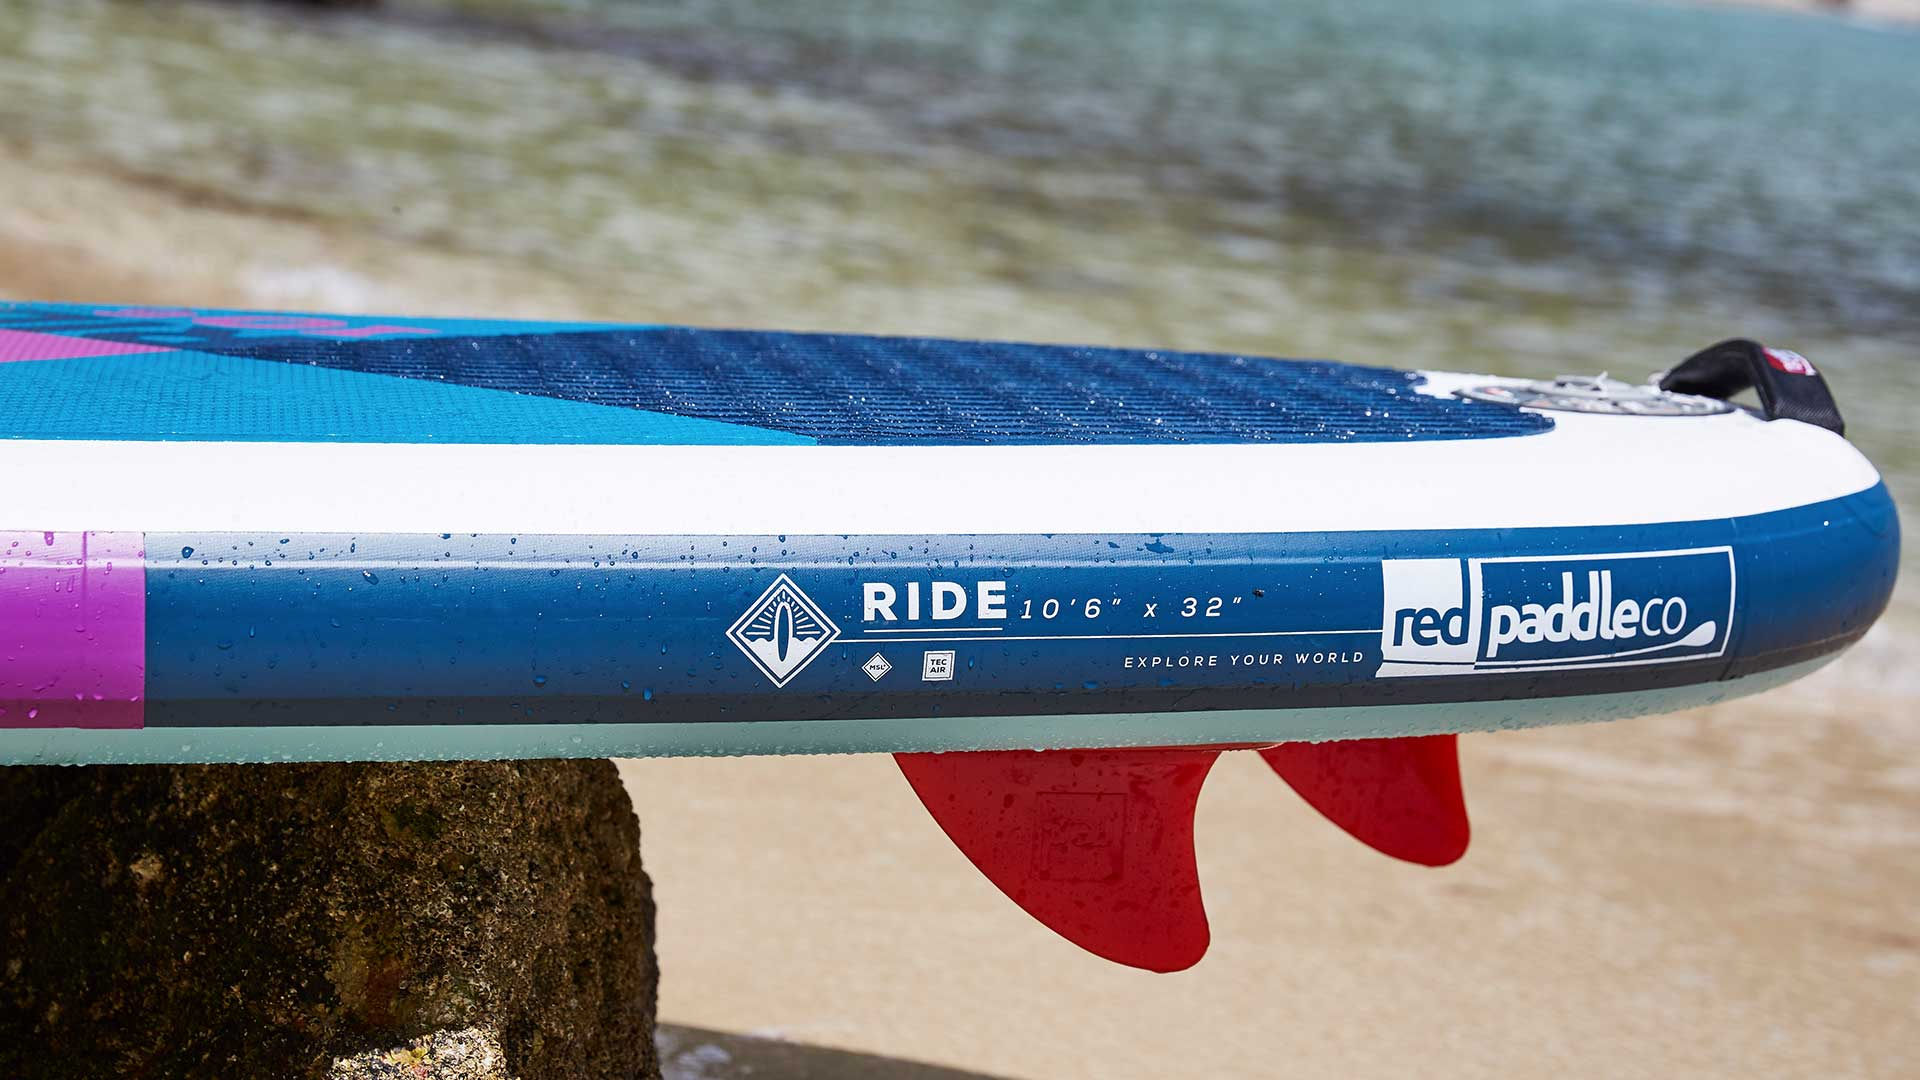 redpaddleco-106-ride-se-msl-inflatable-paddle-board-desktop-gallery-fins